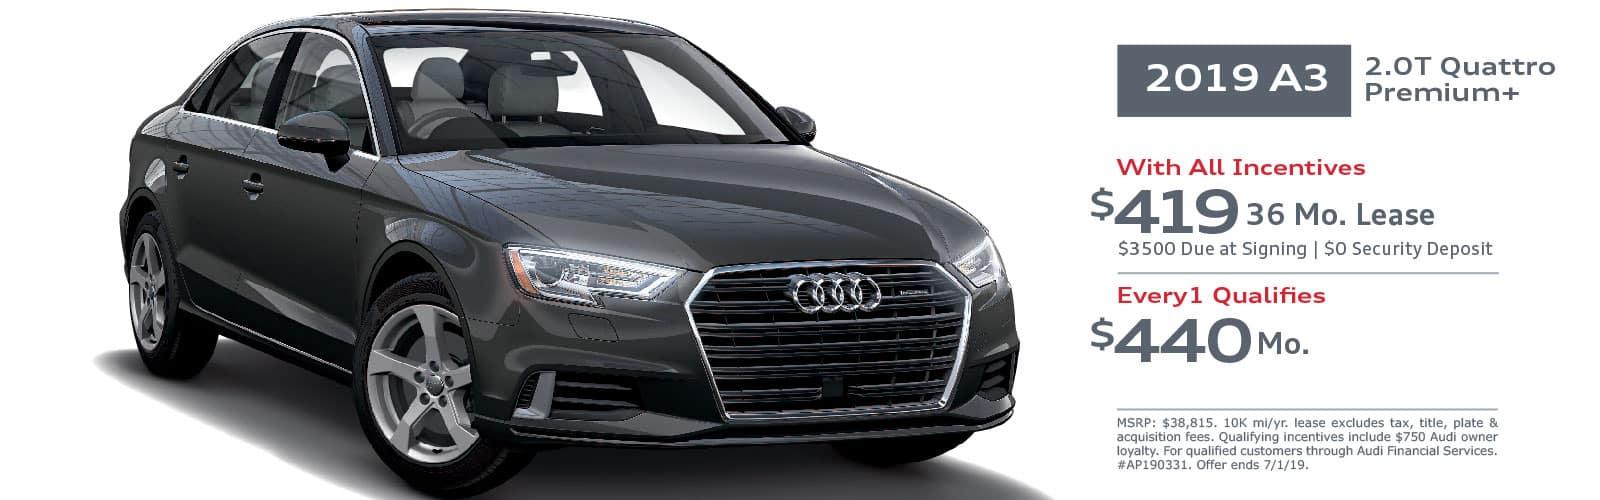 Audi Lease Deals Washington | New Car Lease Specials Pittsburgh | audi new car deals